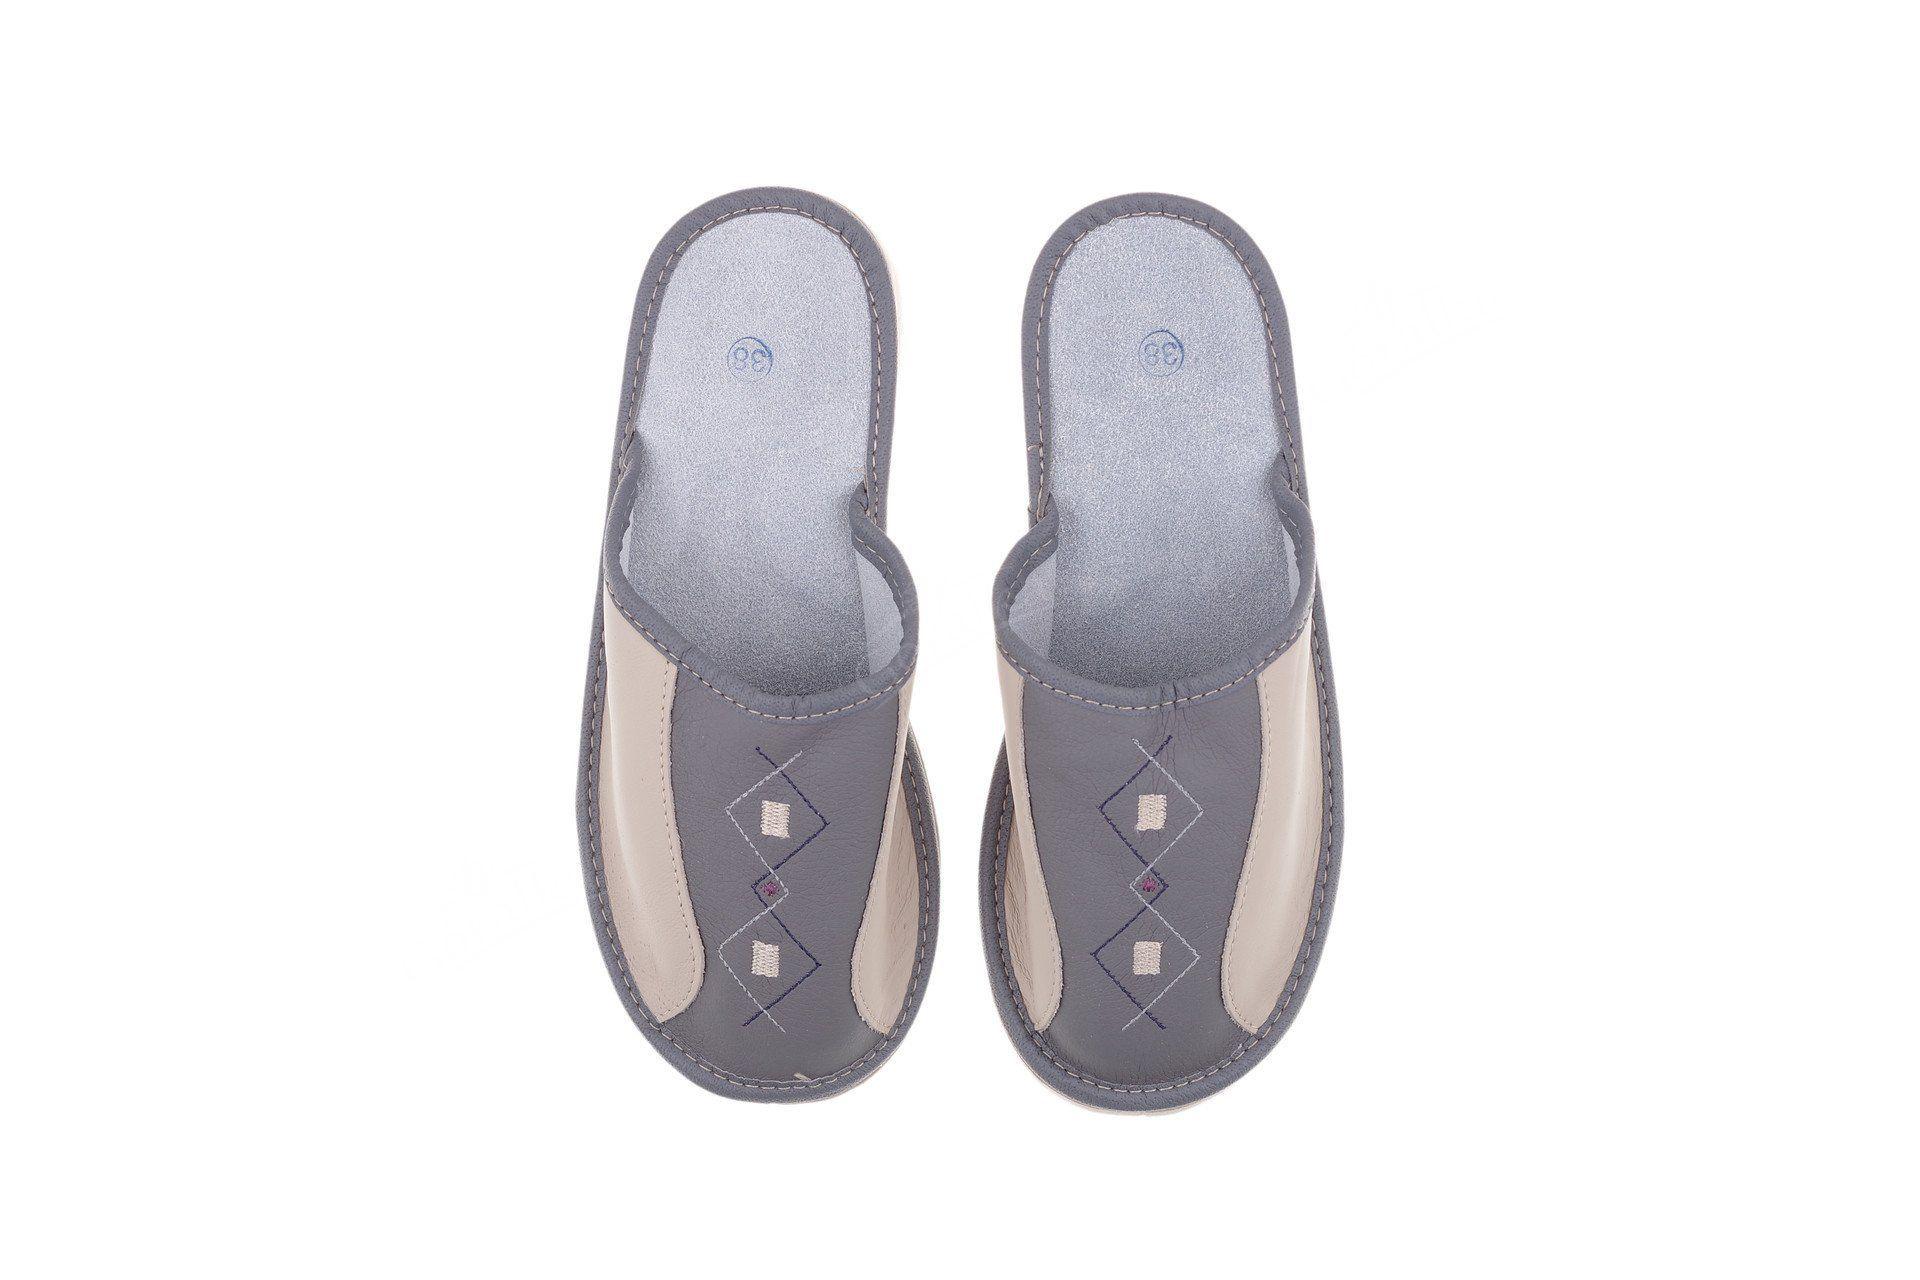 Pantofle skórzane kryte profilowane szare · Pantofle skórzane kryte  profilowane szare ... d72207844b